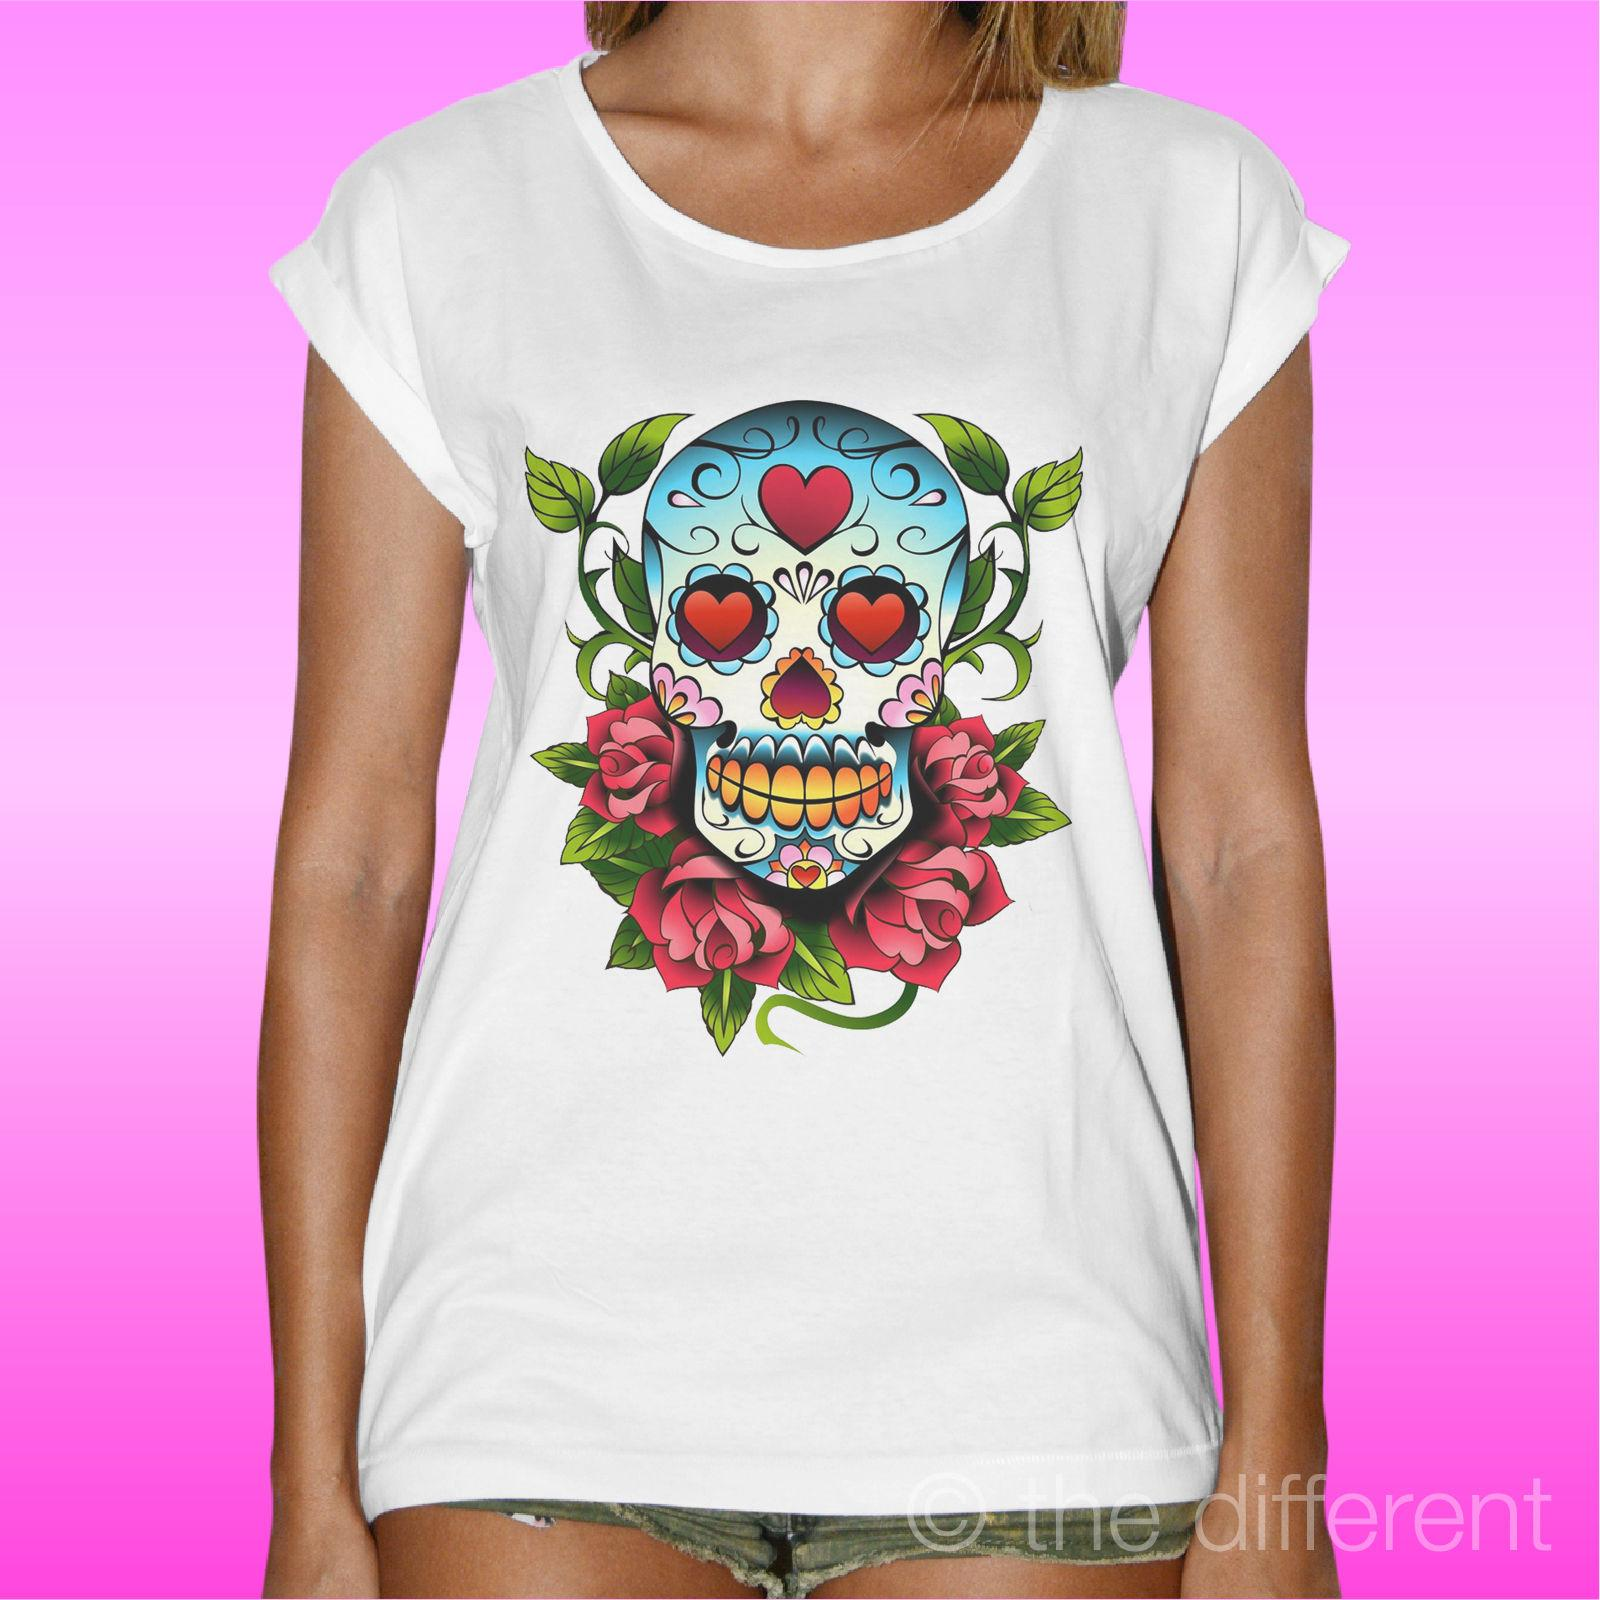 De Camiseta Flores Mexicana Mujer Calavera Regalo Idea uK1c5F3lJT